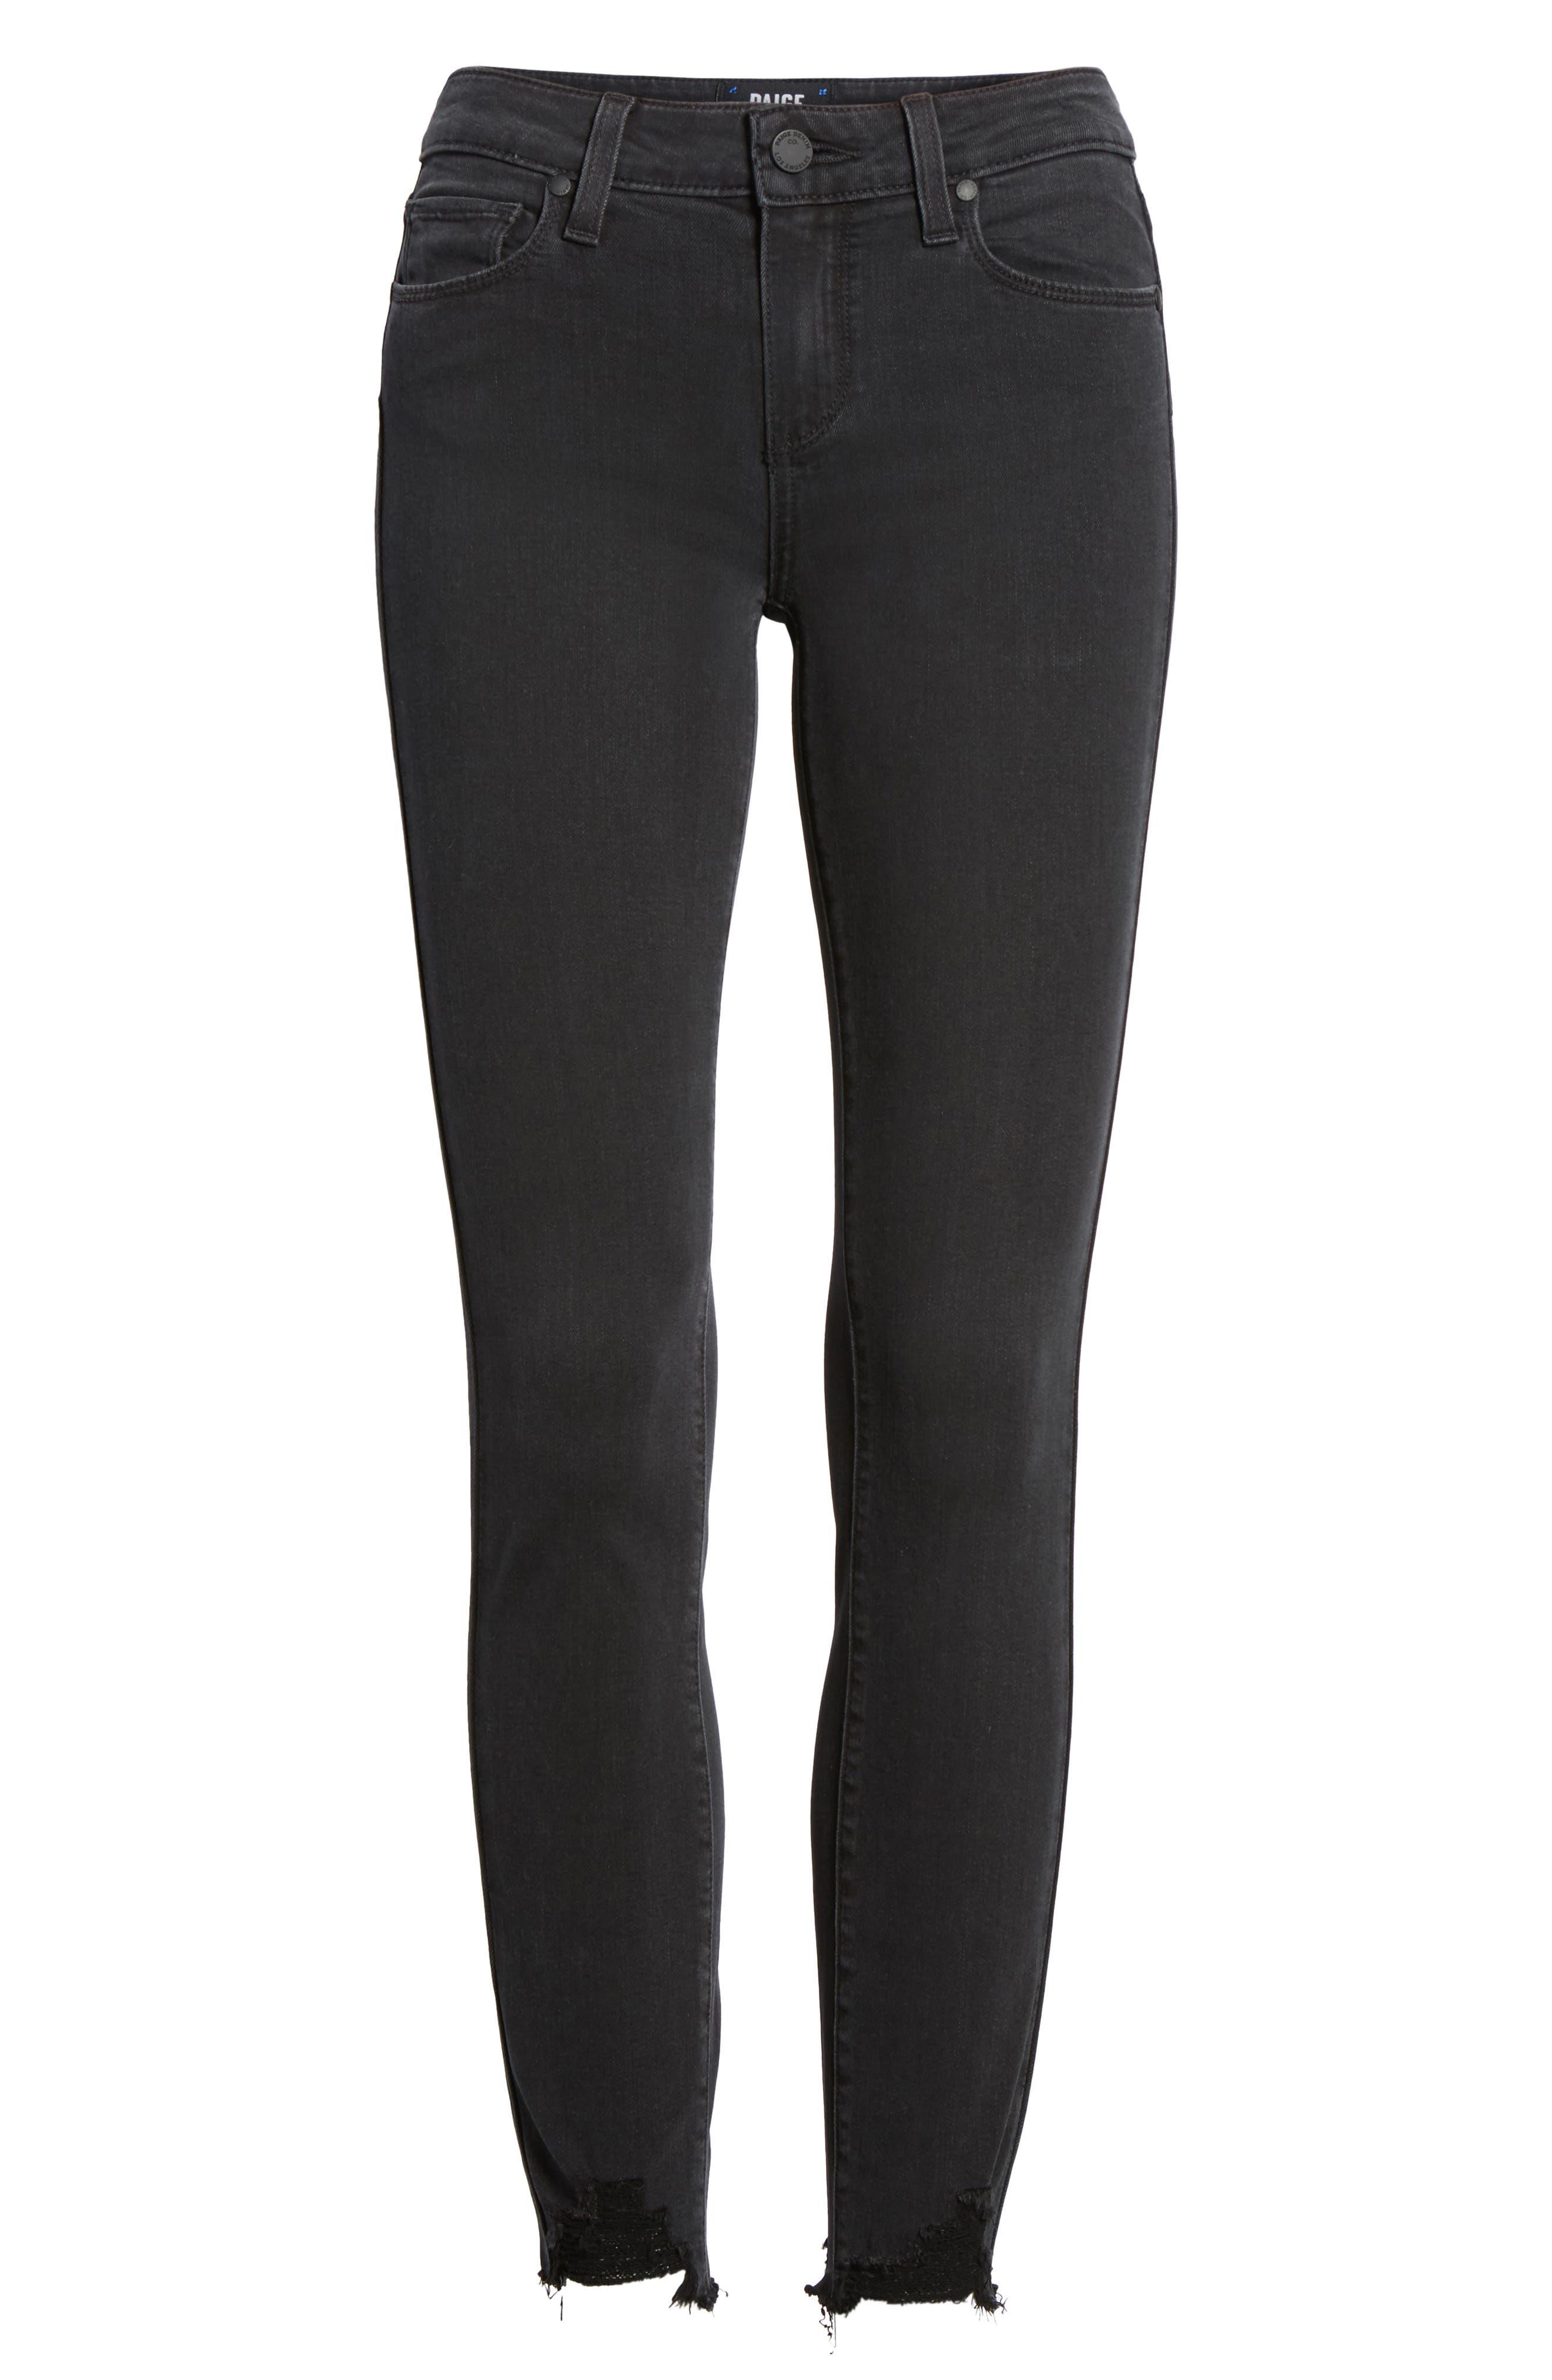 Transcend - Verdugo Ankle Skinny Jeans,                             Alternate thumbnail 7, color,                             Black Fog Super Distressed